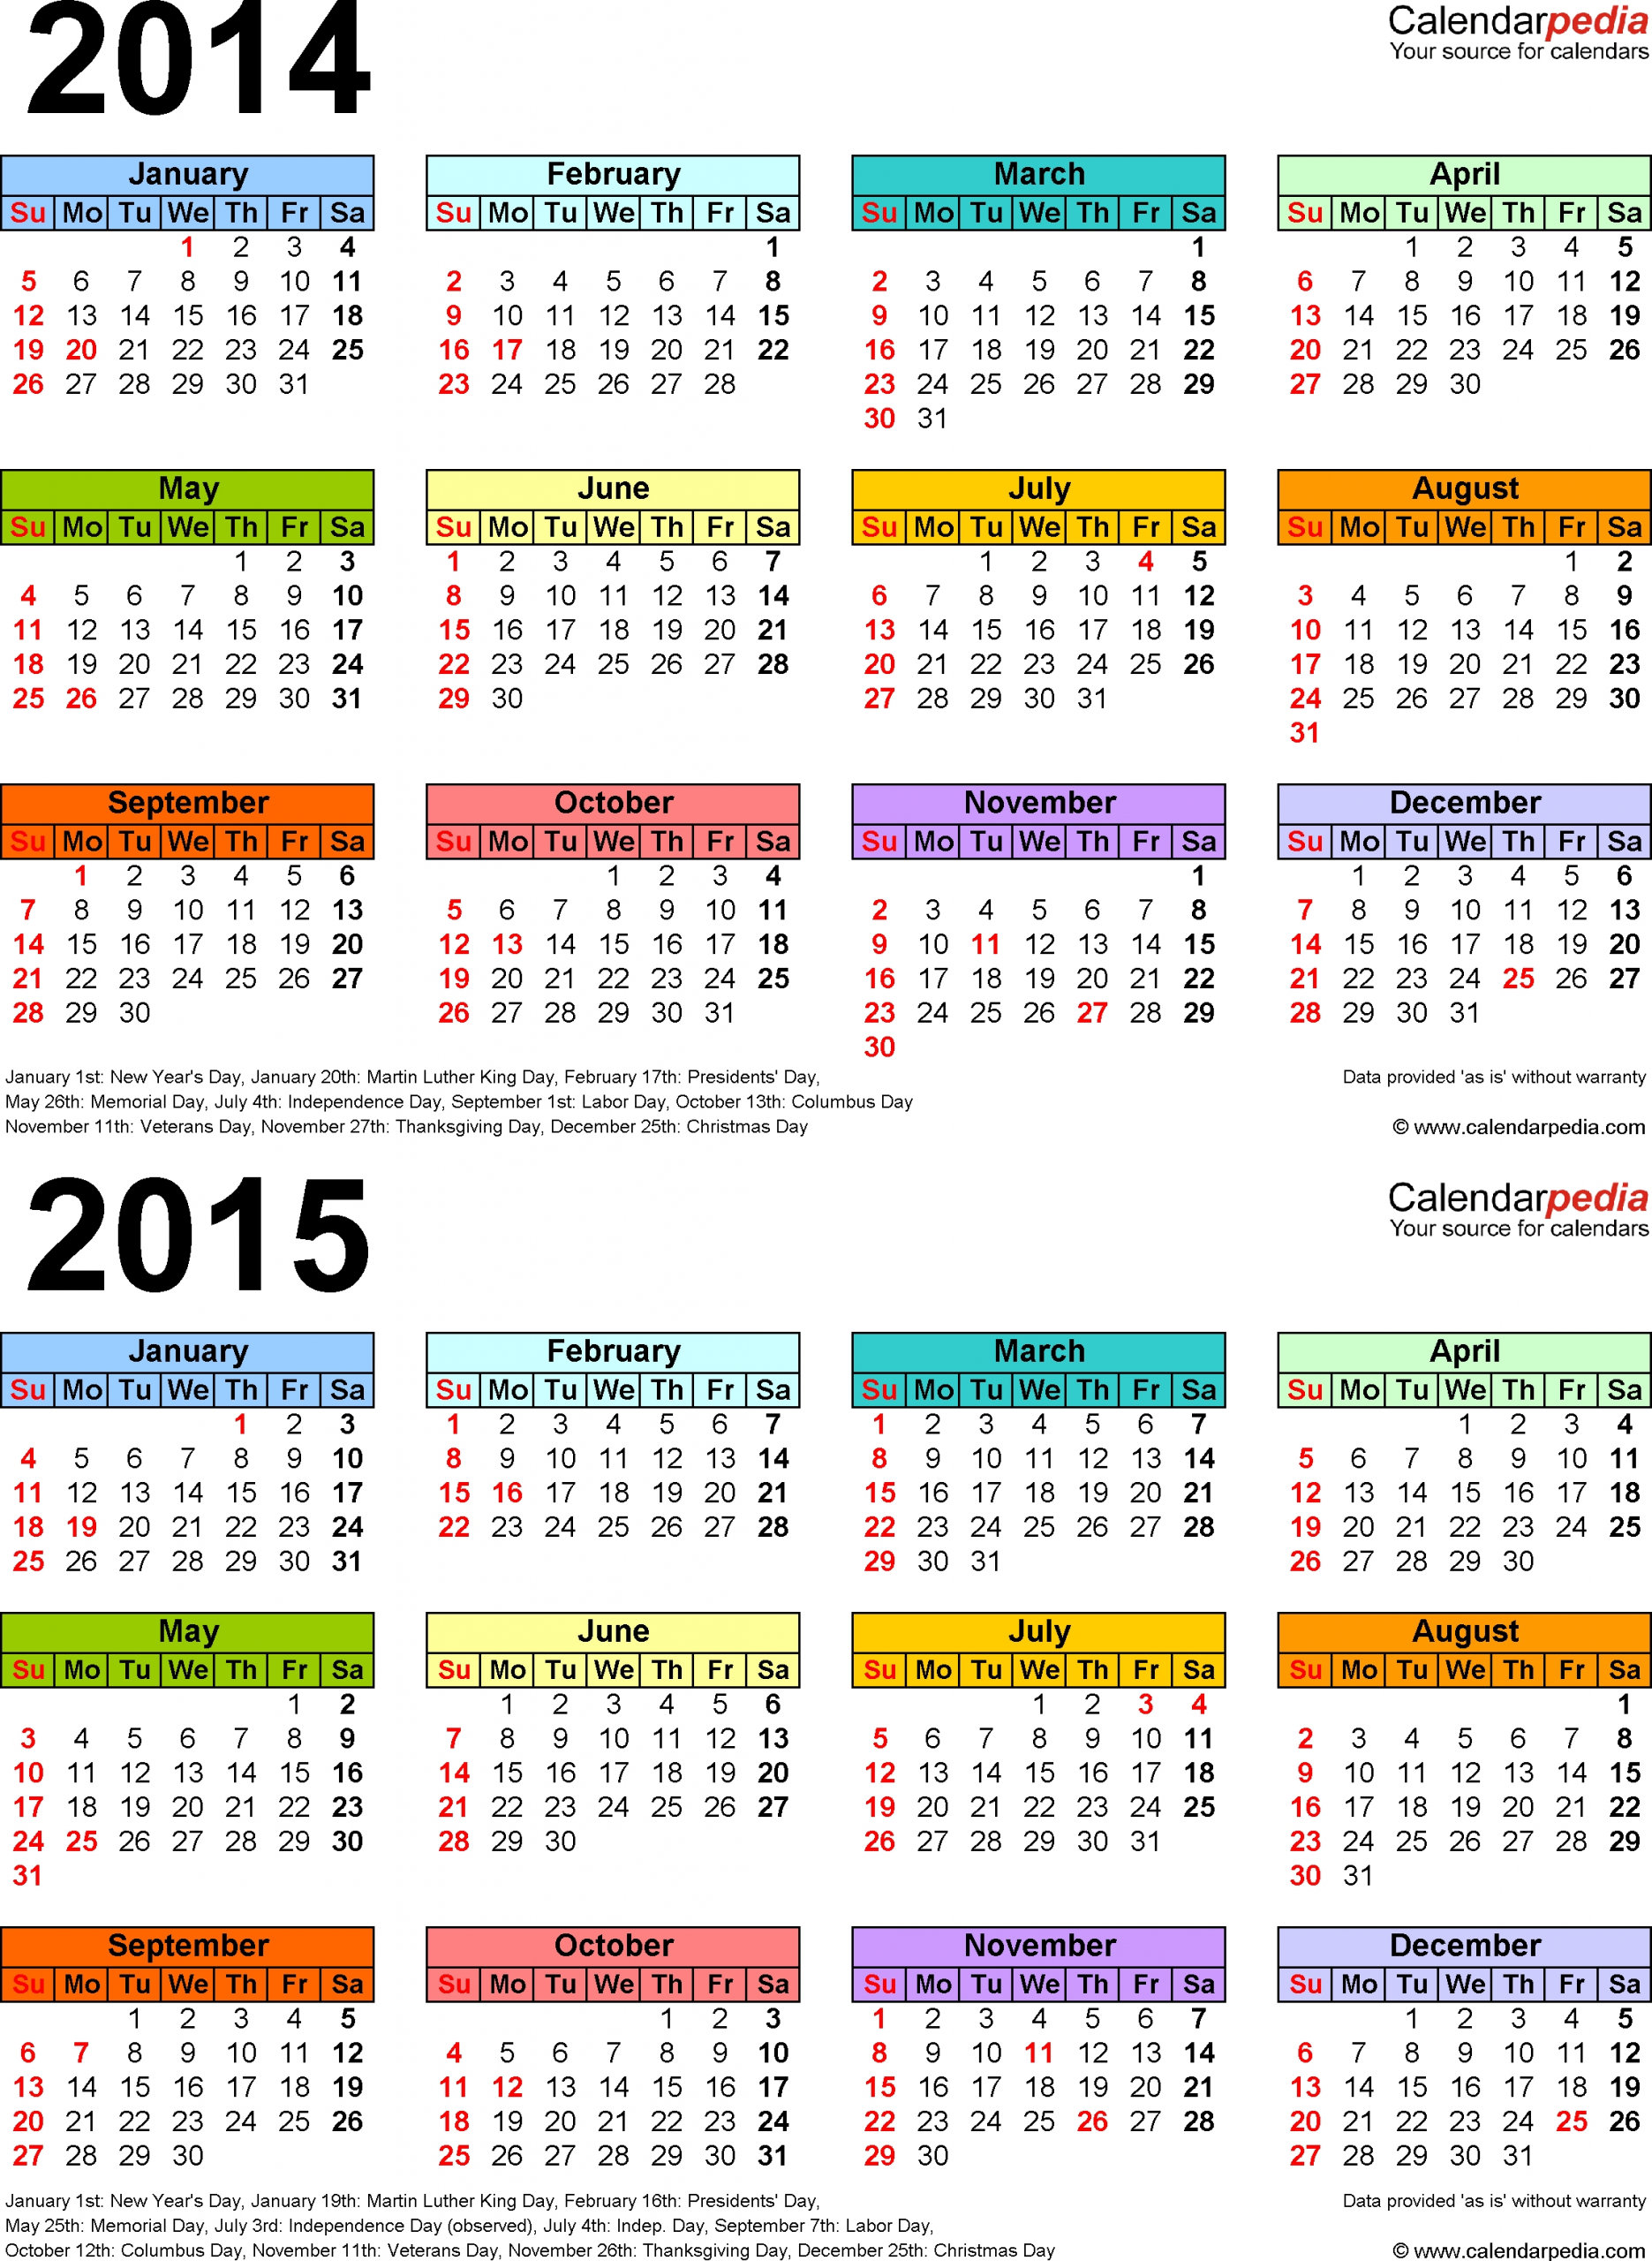 16 Blank Calendar Template 2014 2015 Images - August 2015  2014-2015 Financial Year Calendar Australia